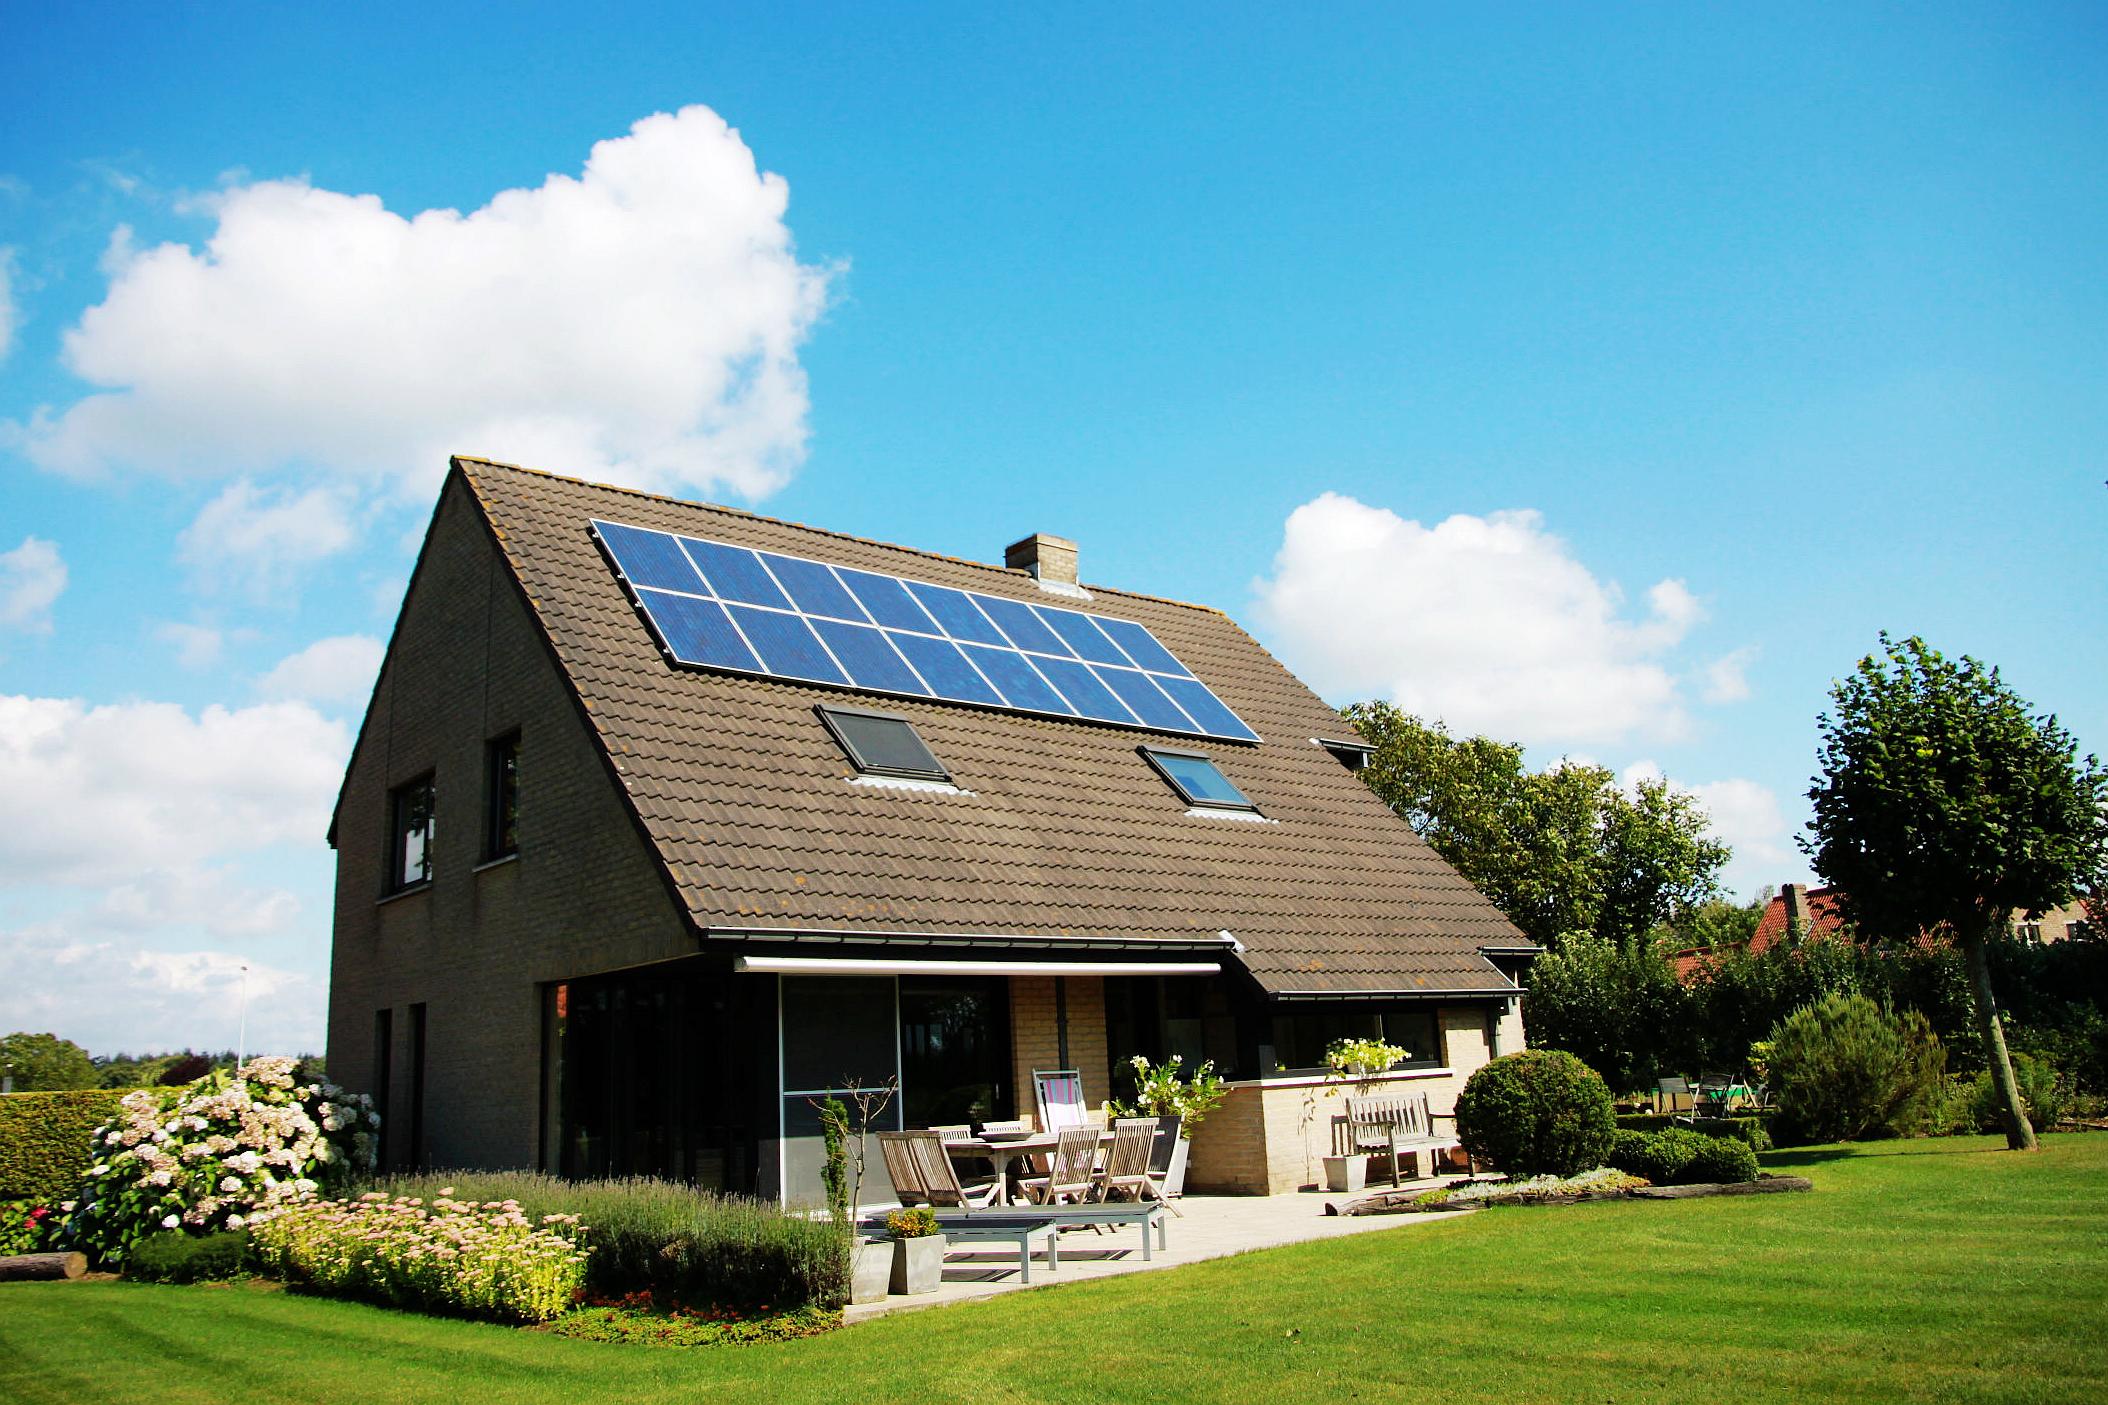 solar-power-clean-energy-rooftop-solar-installations-solar-panels-belgium-solar-panels-on-roof_t20_yvelY6.jpg